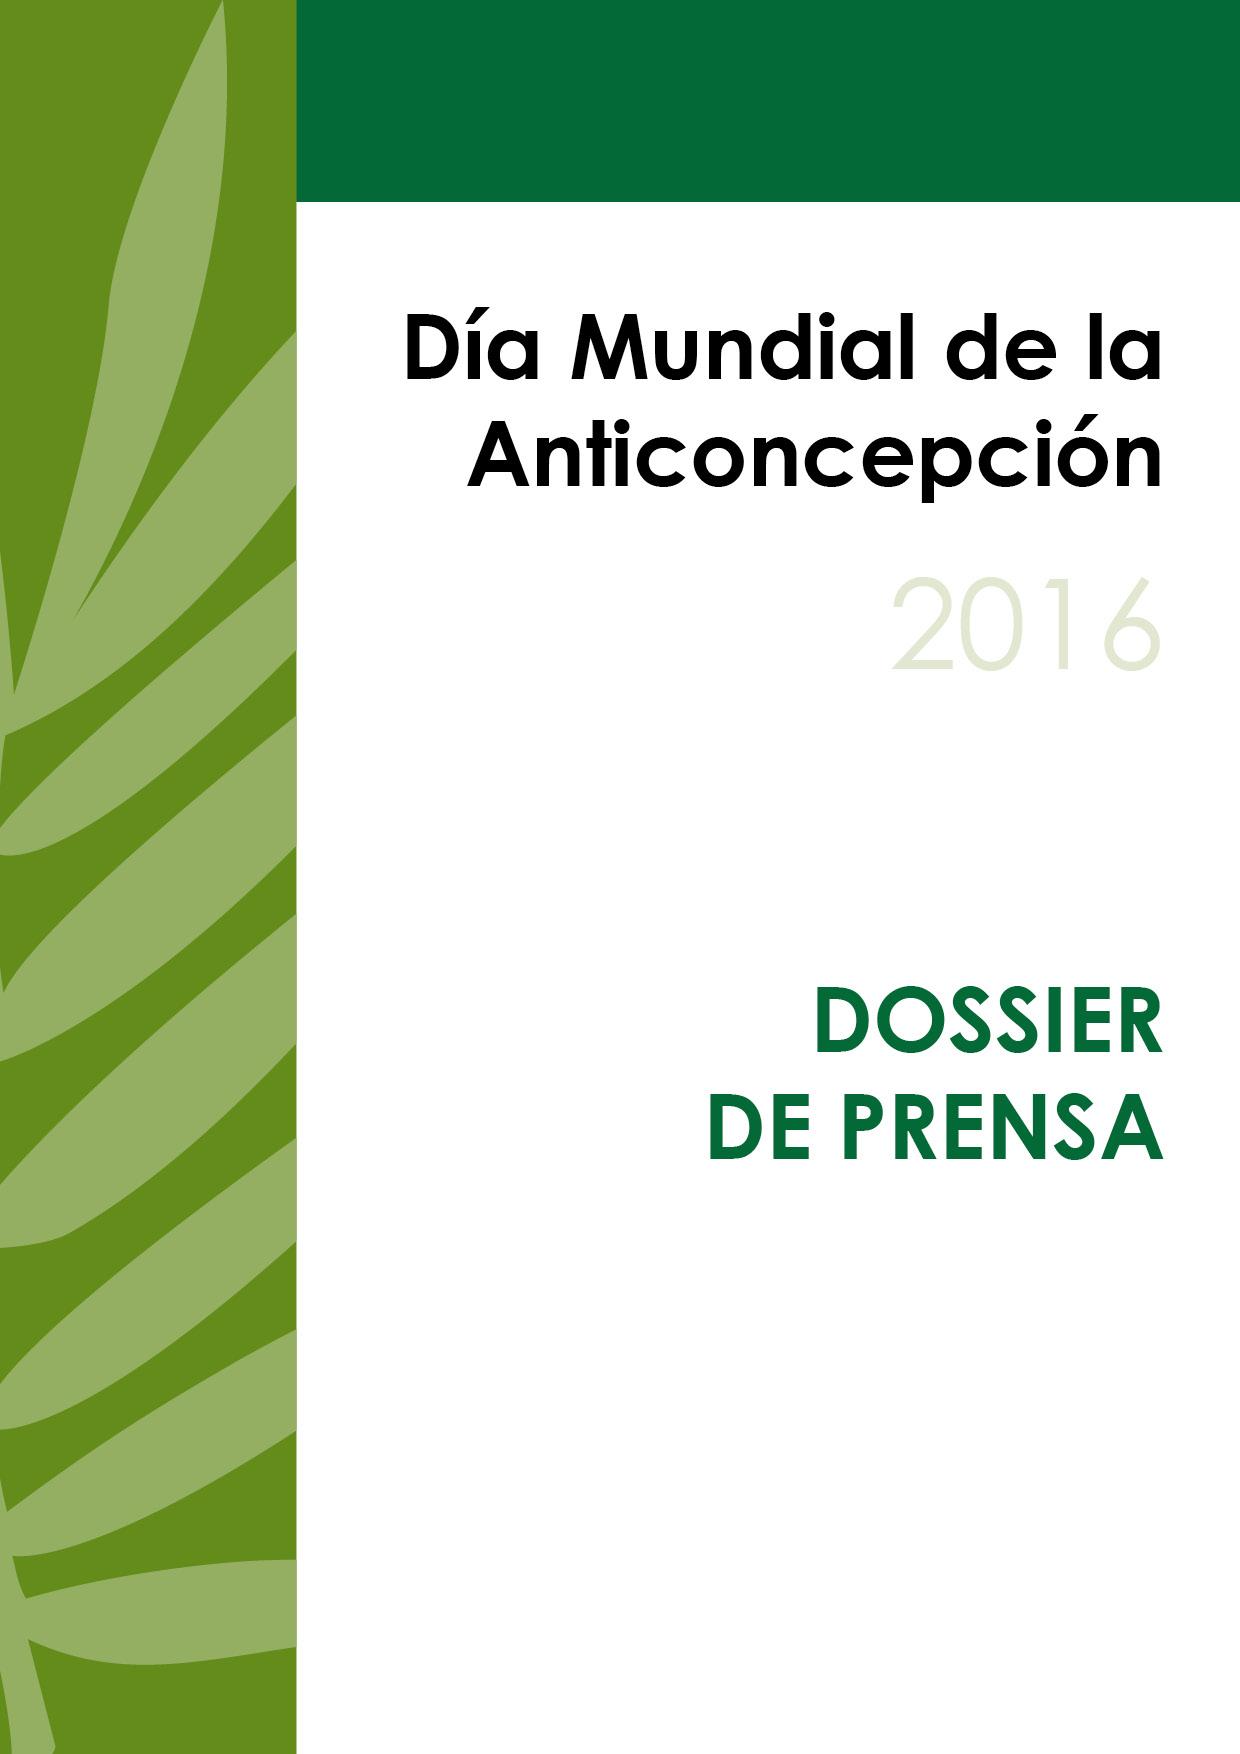 Portada_DossierPrensa_2016